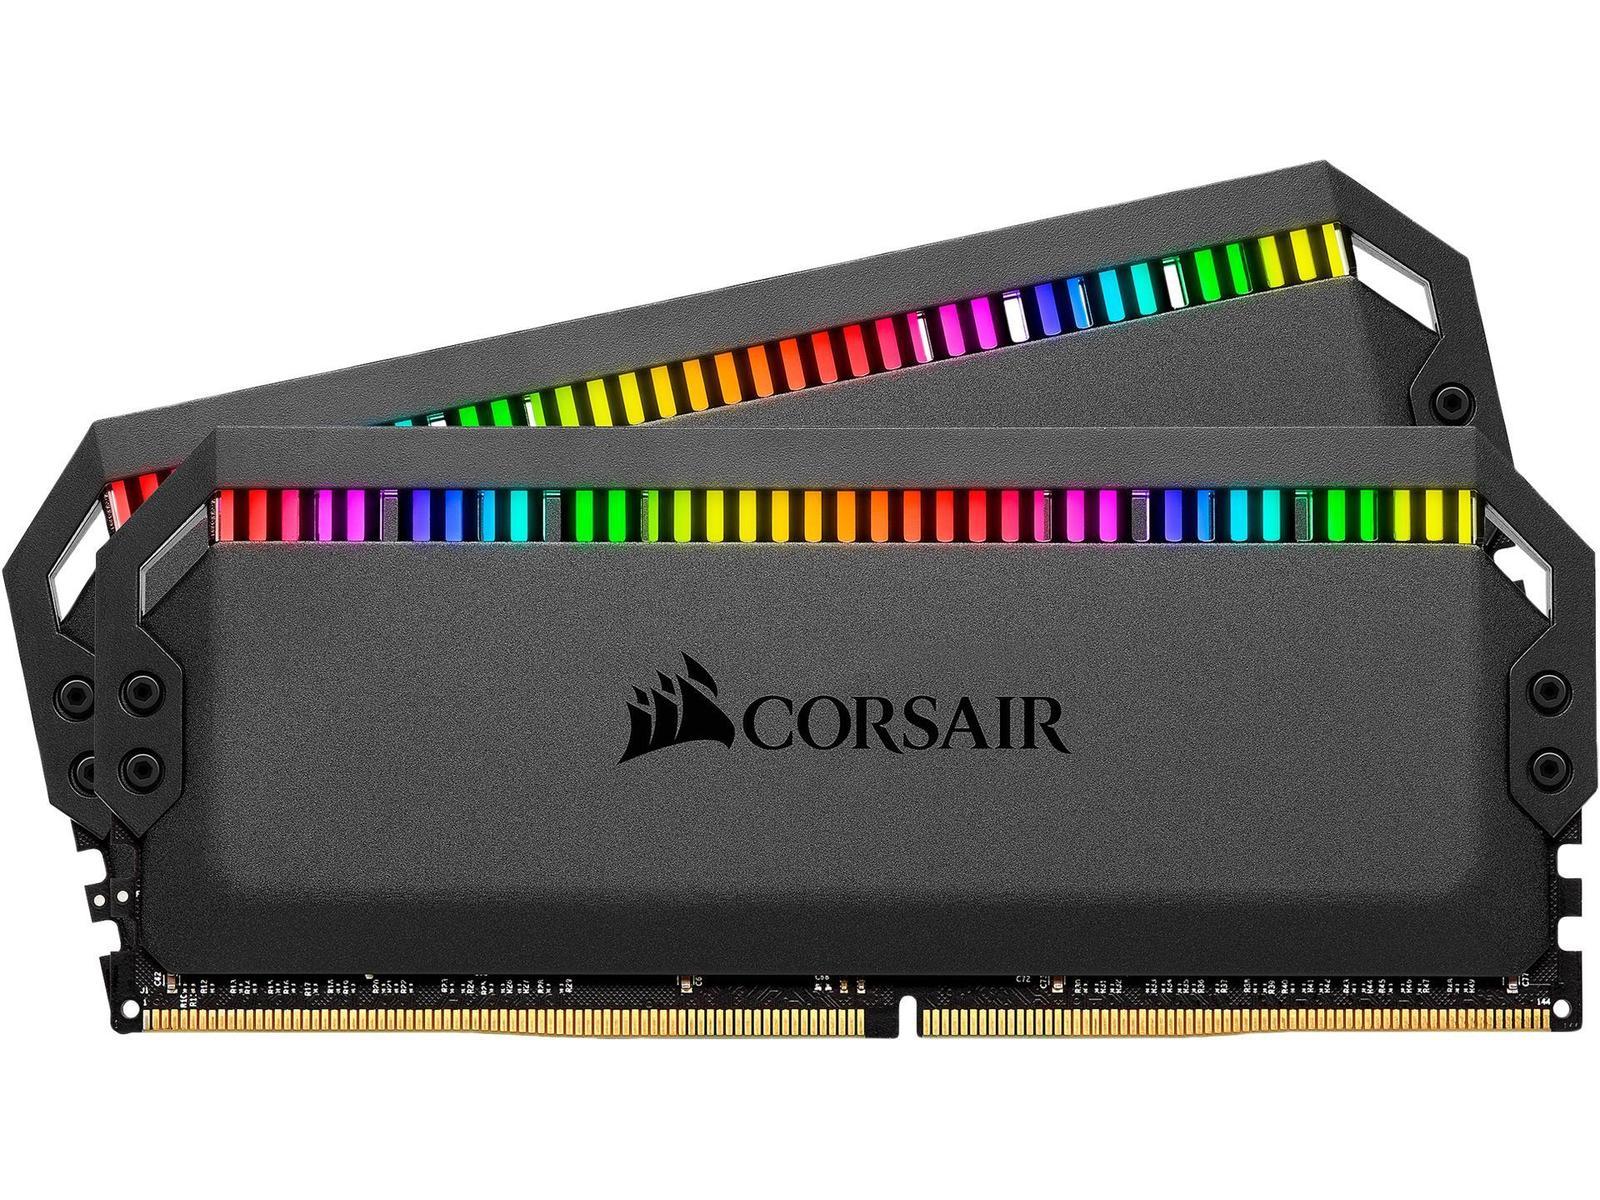 Corsair Dominator Platinum RGB 16 GB (2 x 8 GB) DDR4-3200 CL16 Memory